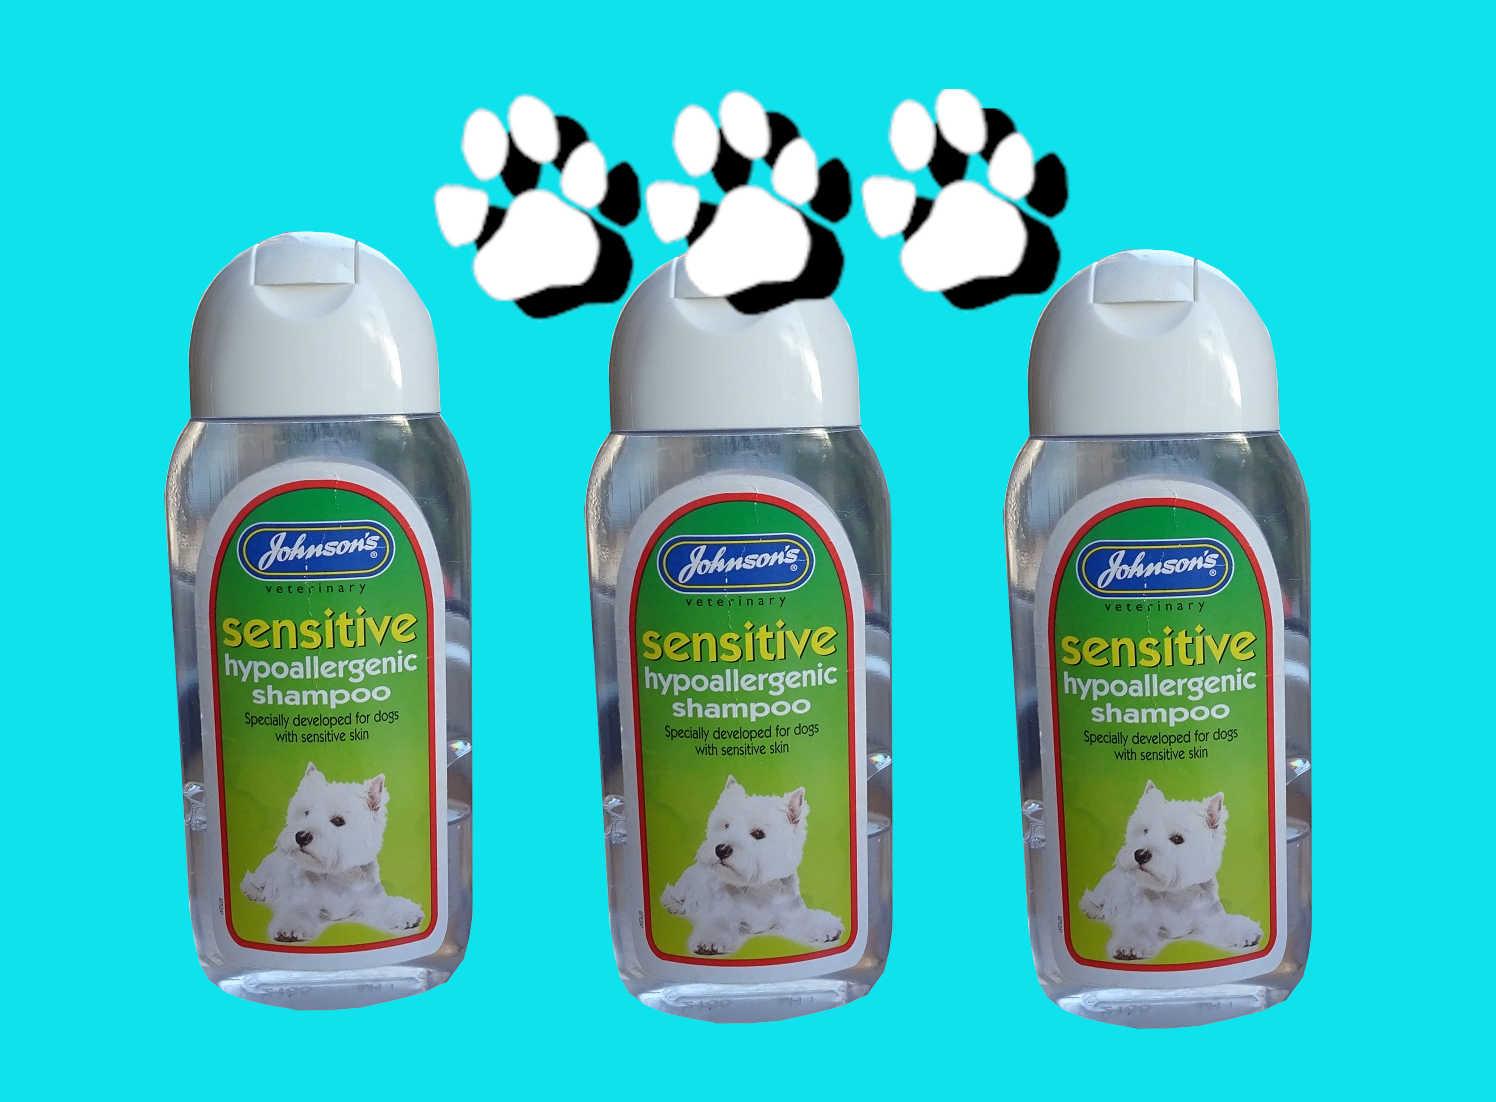 hypo shampoo 3 paws